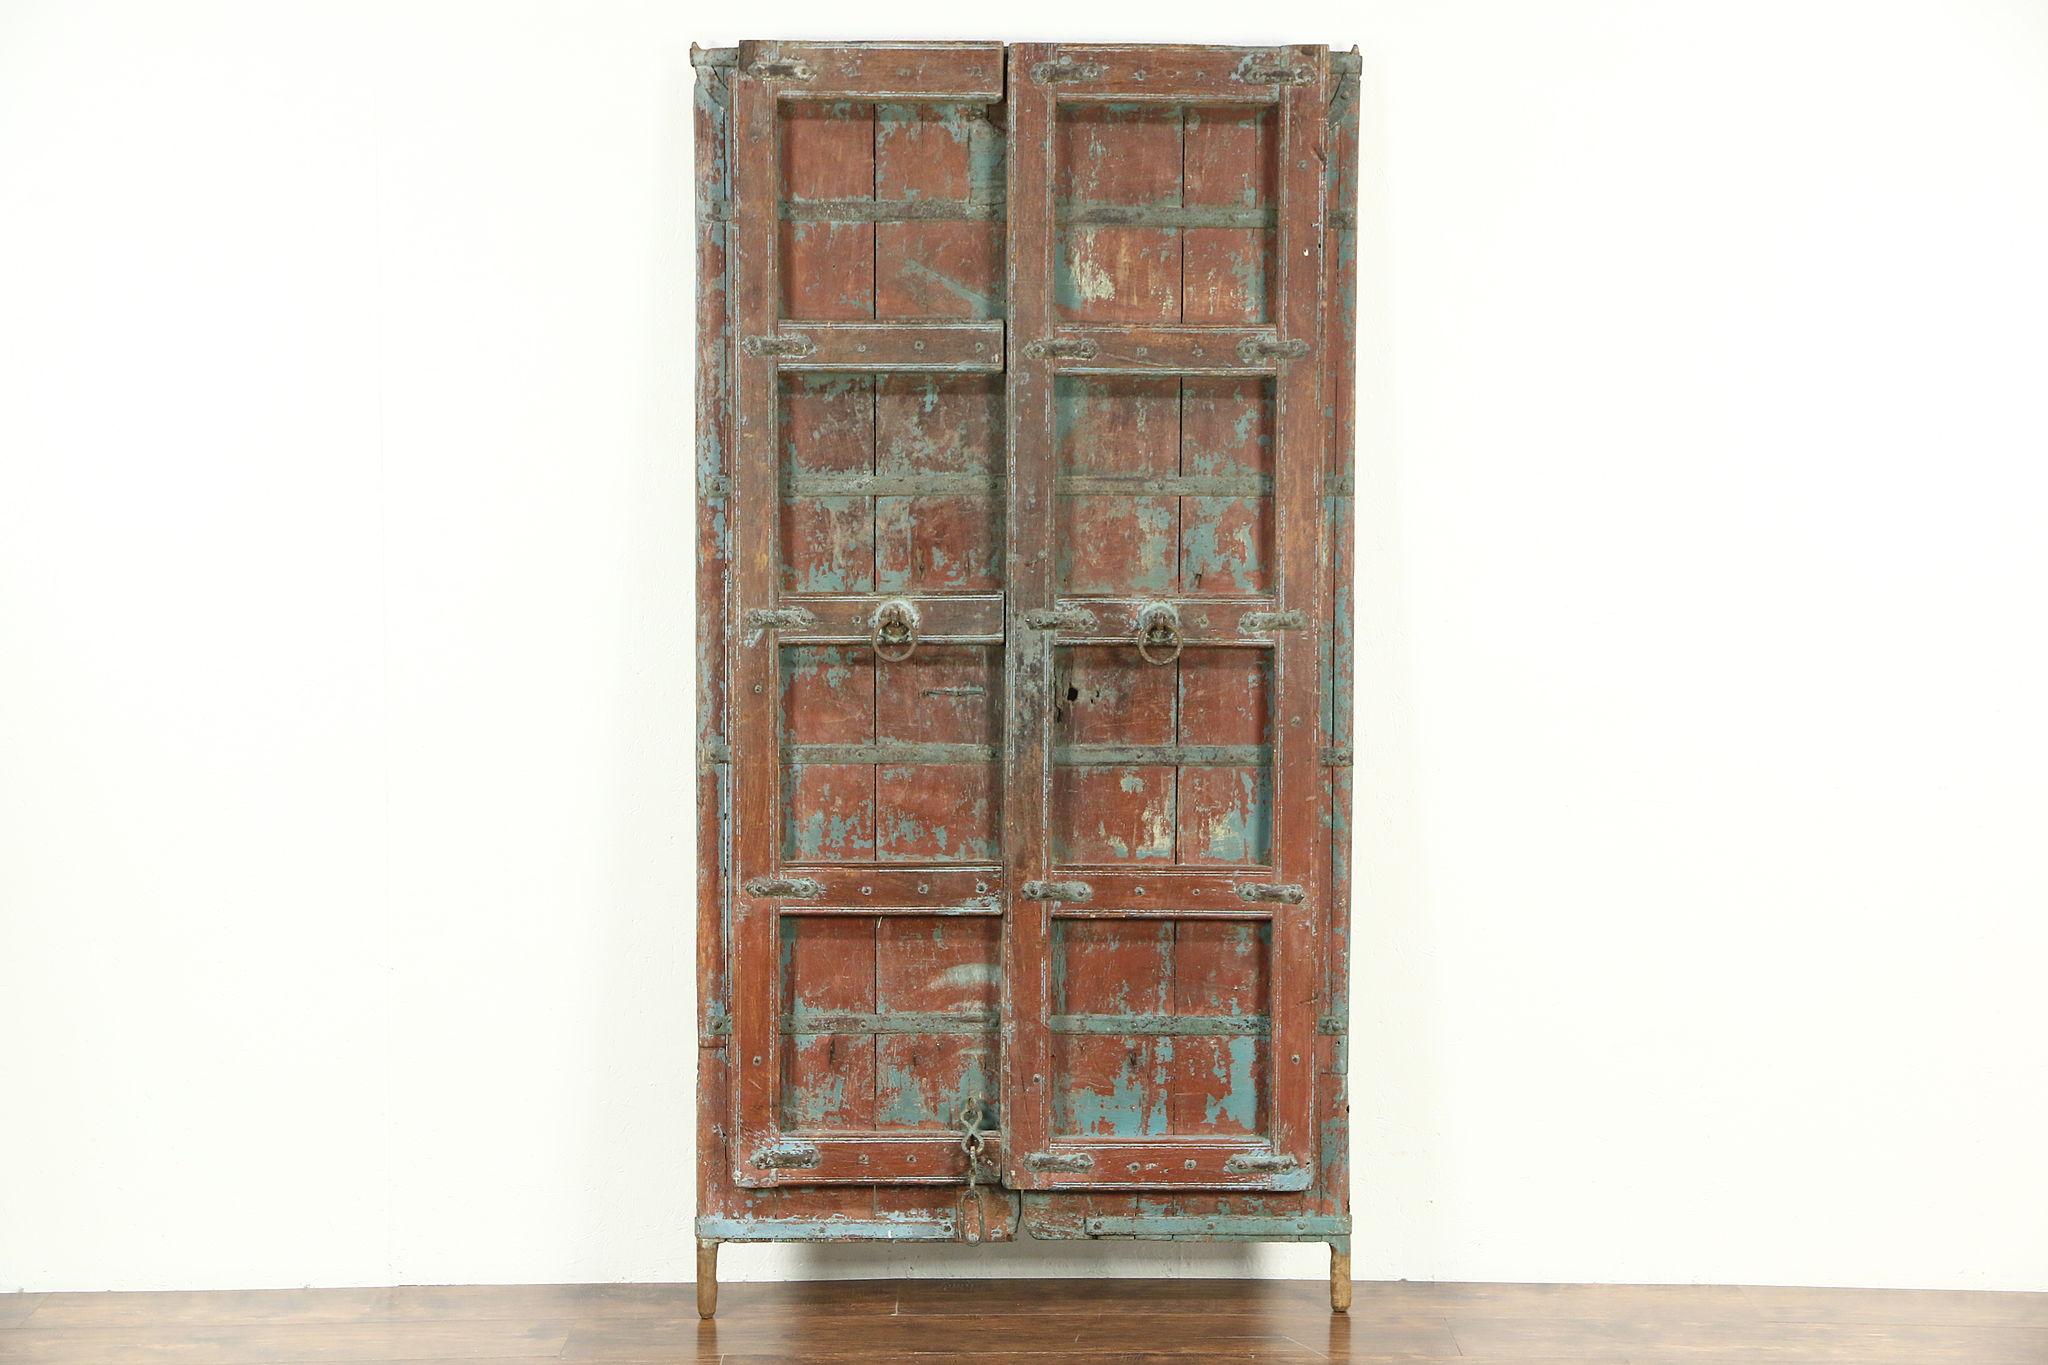 Dutch east indies java antique 1900 architectural salvage pair of teak doors photo